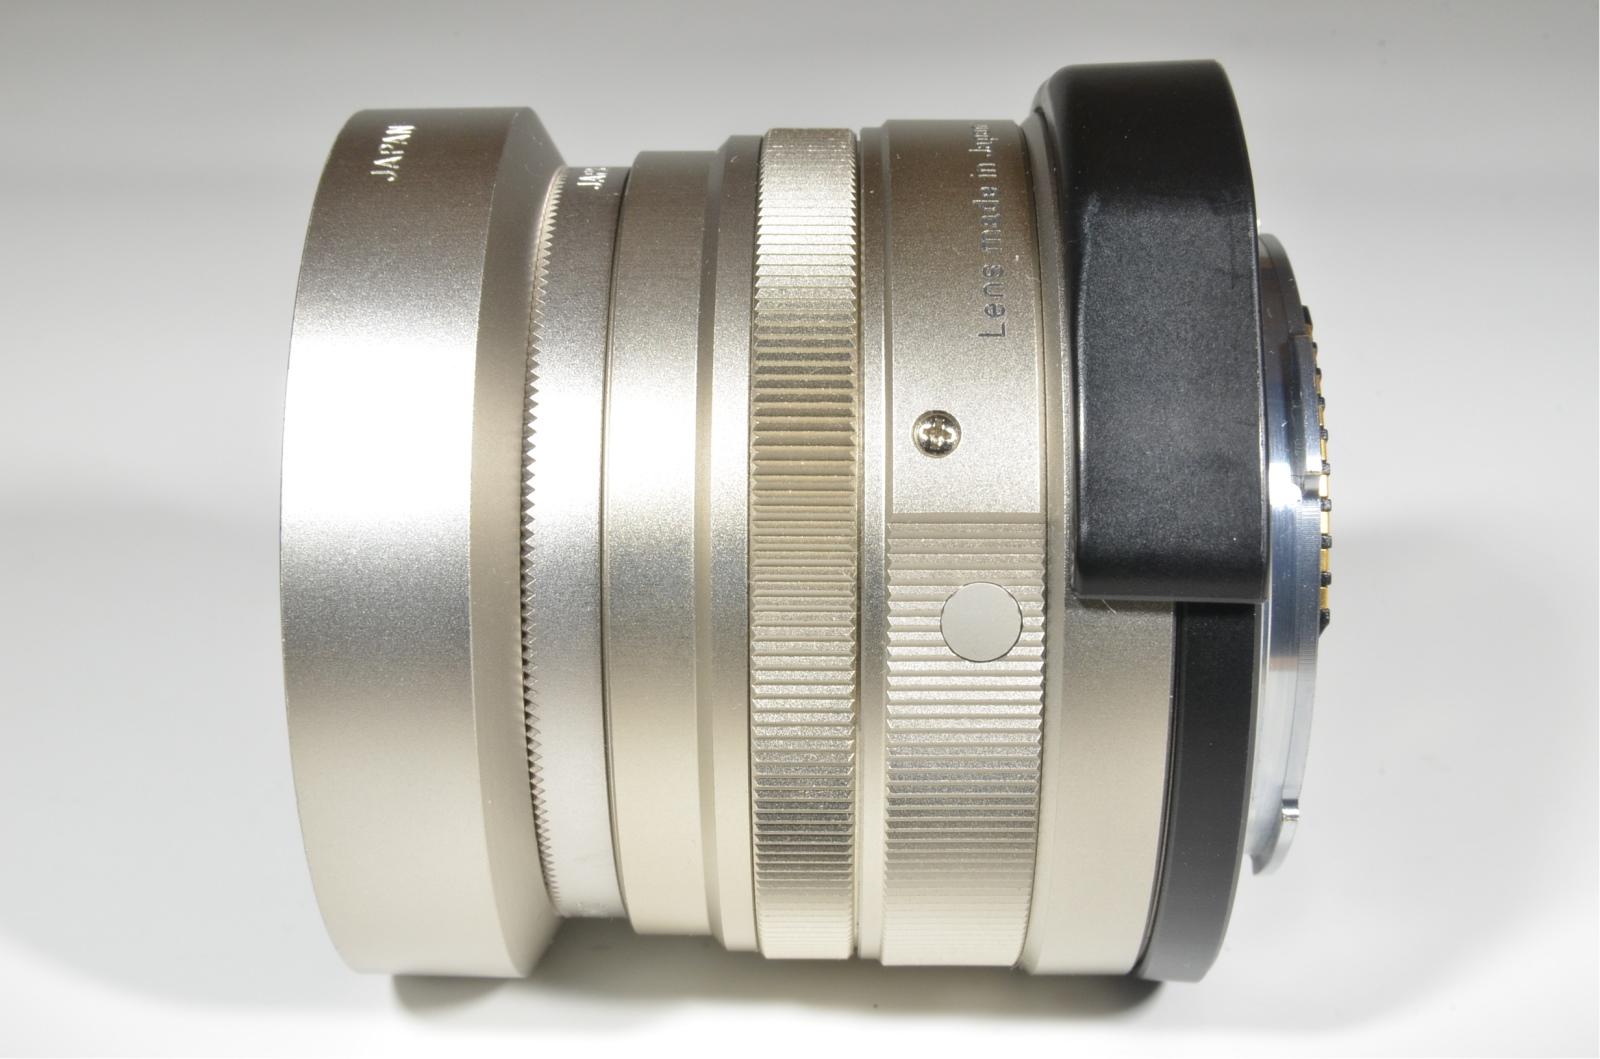 contax g2 data back 35mm rangefinder film camera with planar 45mm f2